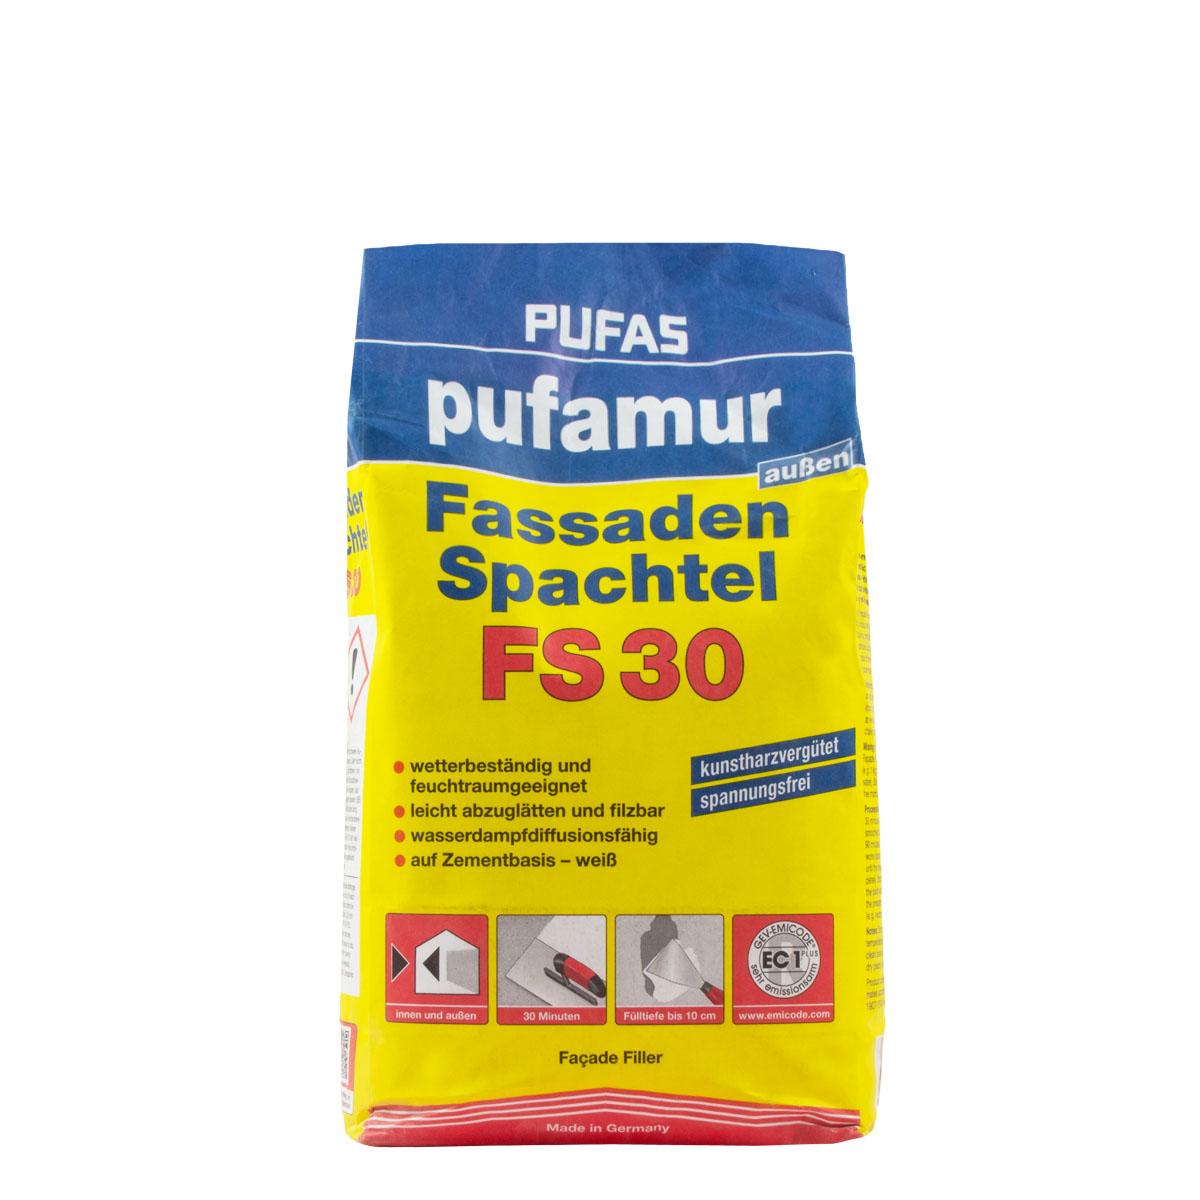 Pufas pufamur Fassadenspachtel FS 30 5kg, kunstharz Zementspachtel